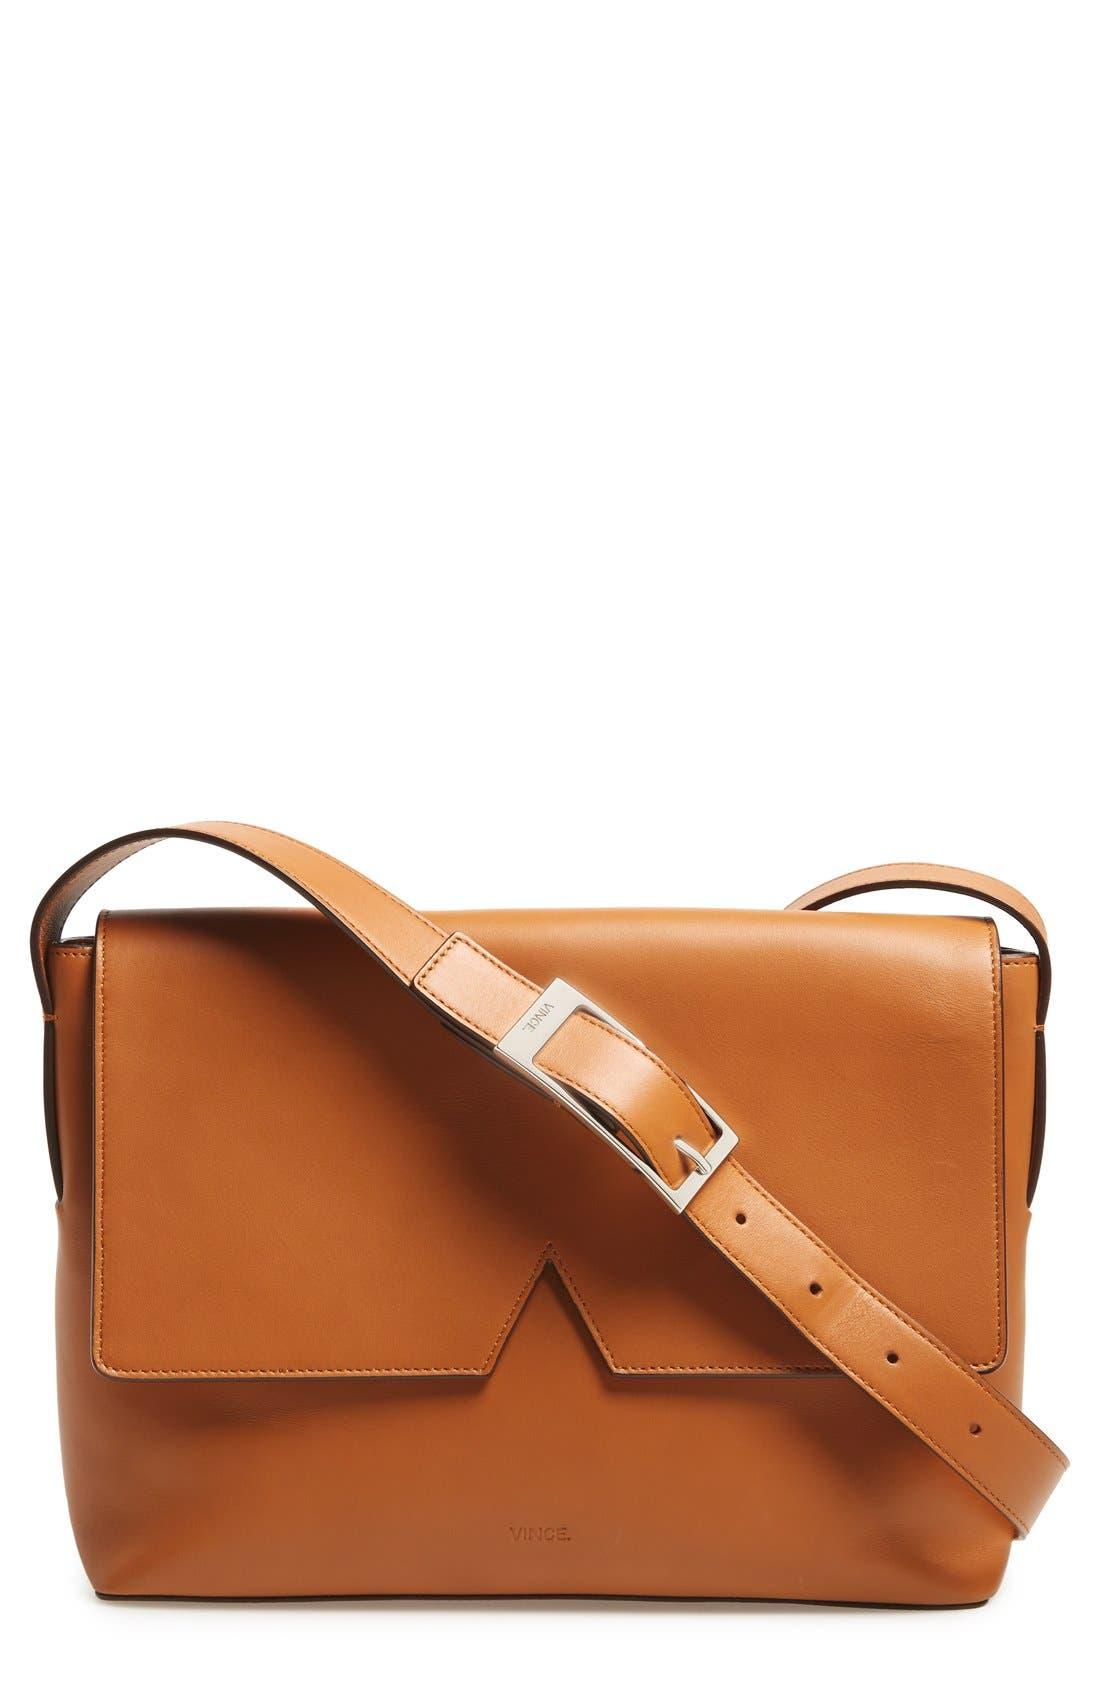 Alternate Image 1 Selected - Vince 'Signature Collection - Medium' Leather Messenger Bag